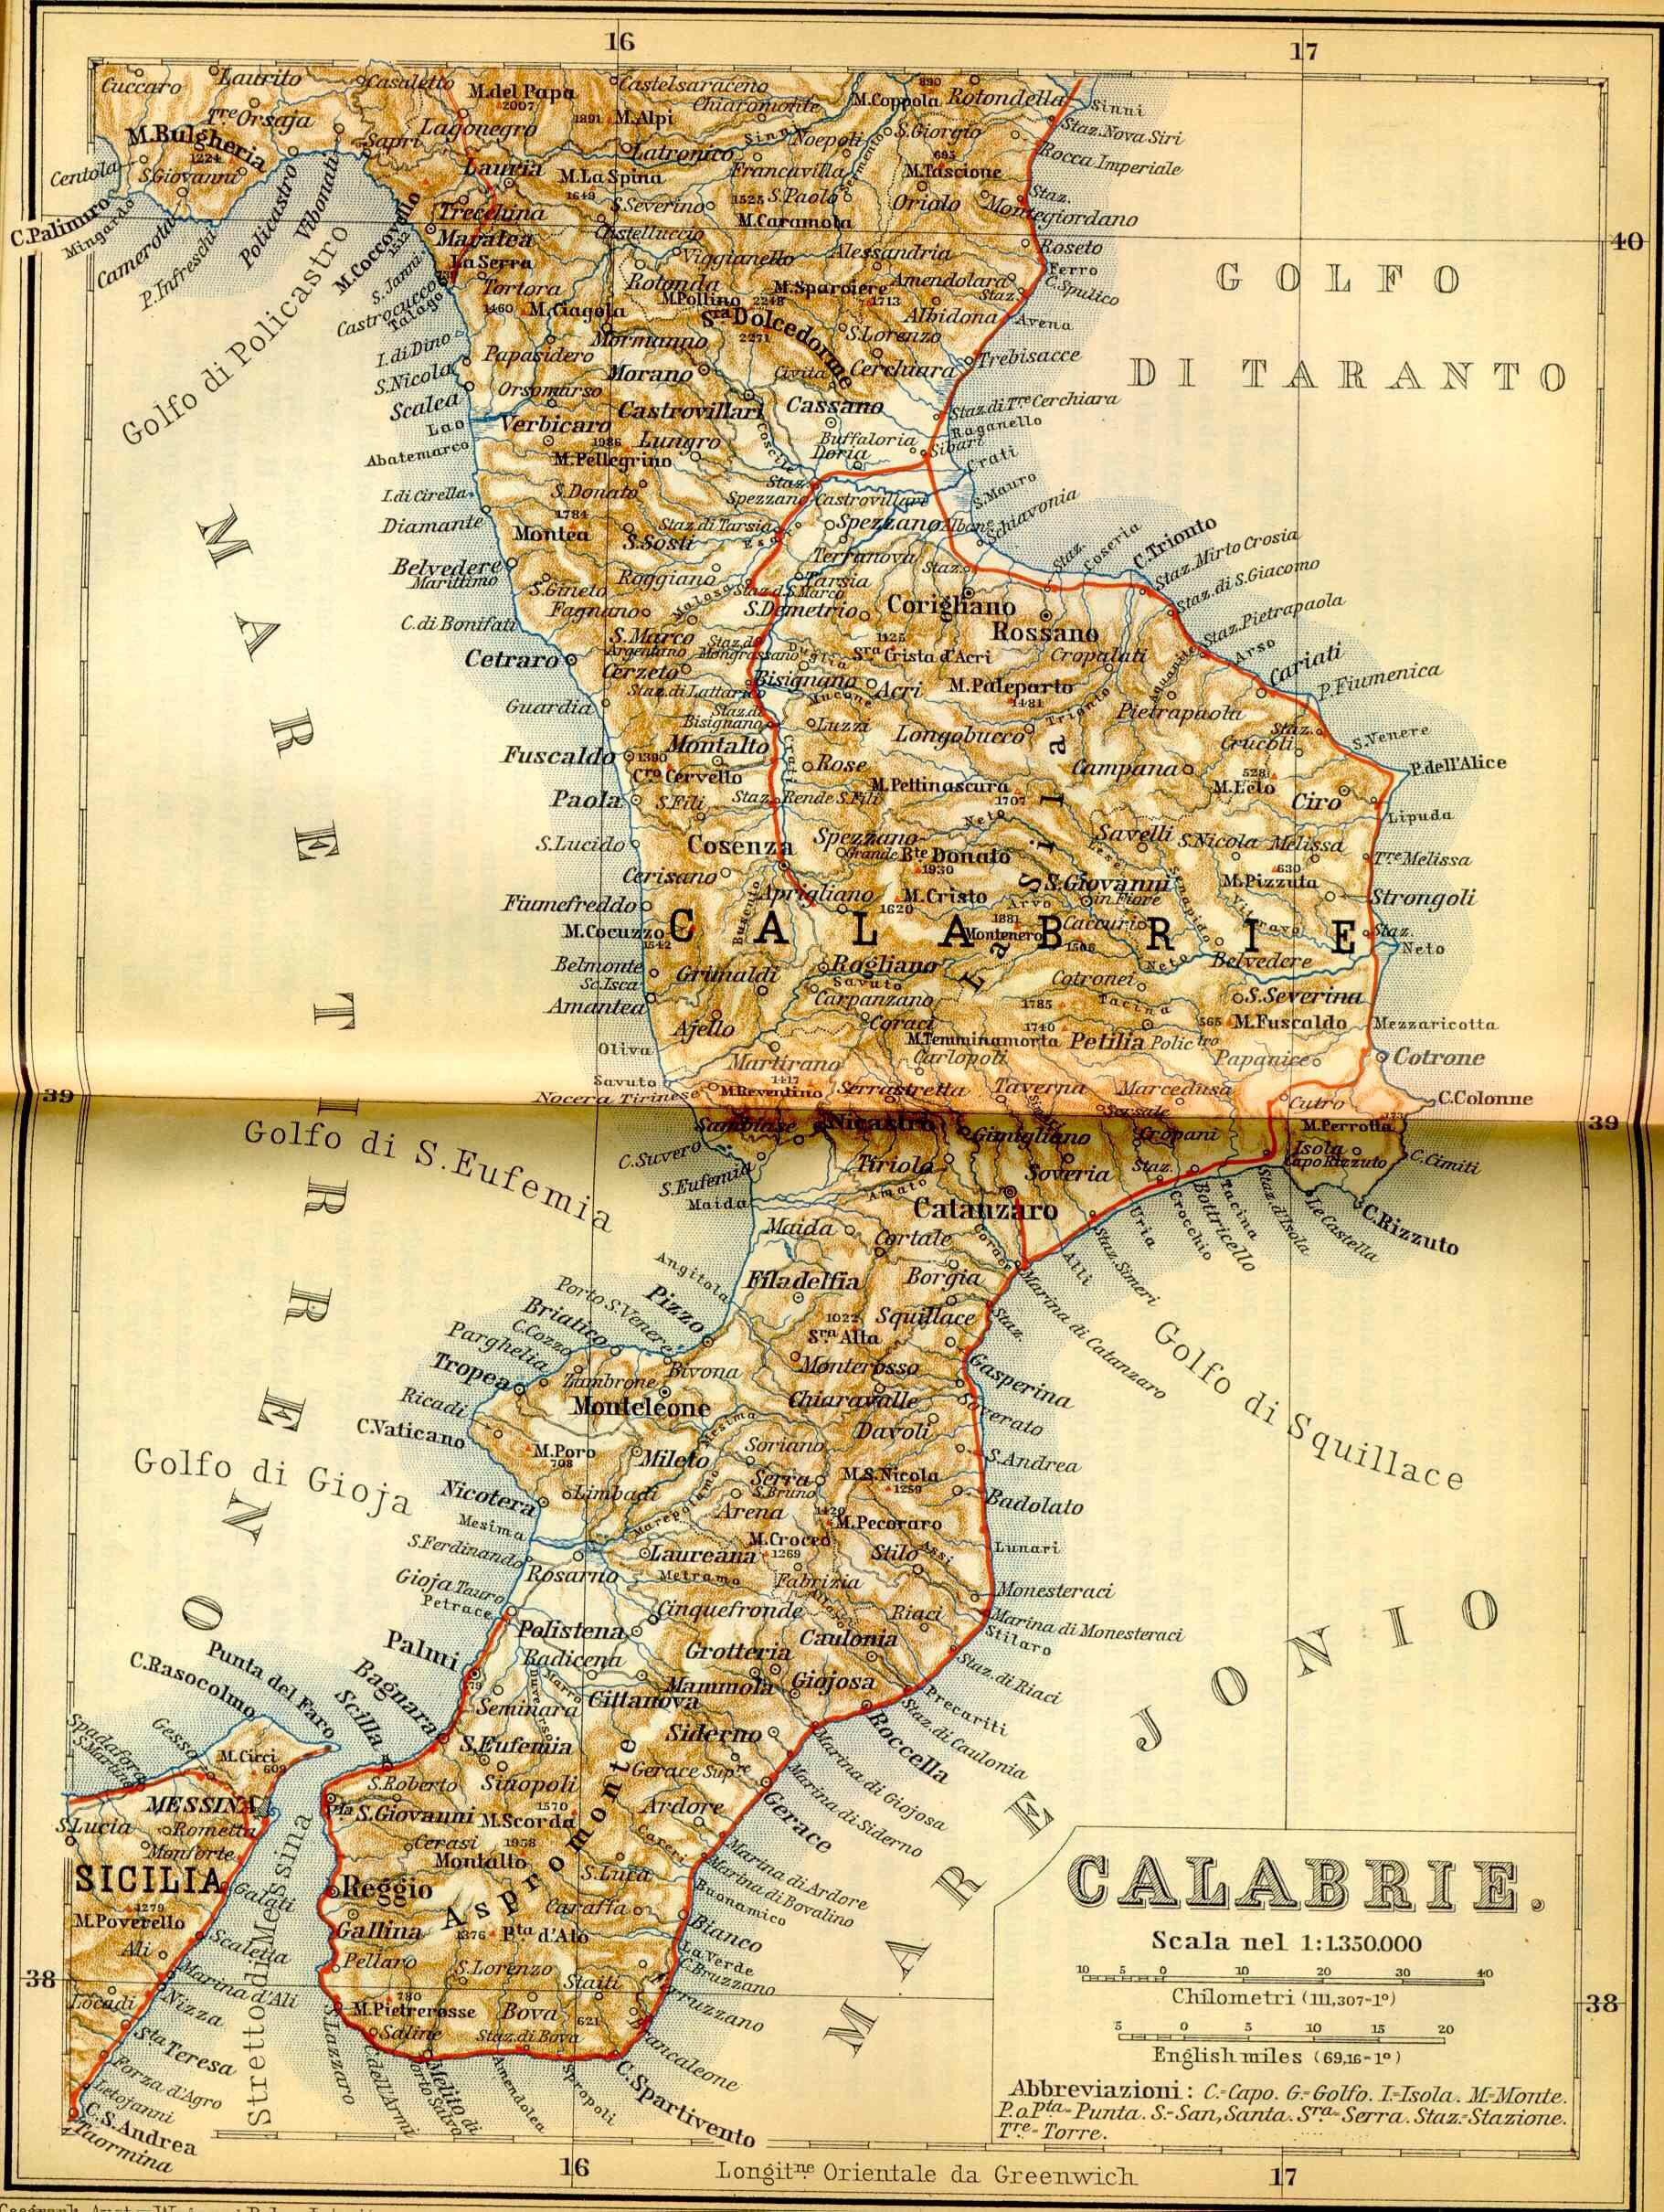 Calabria Region